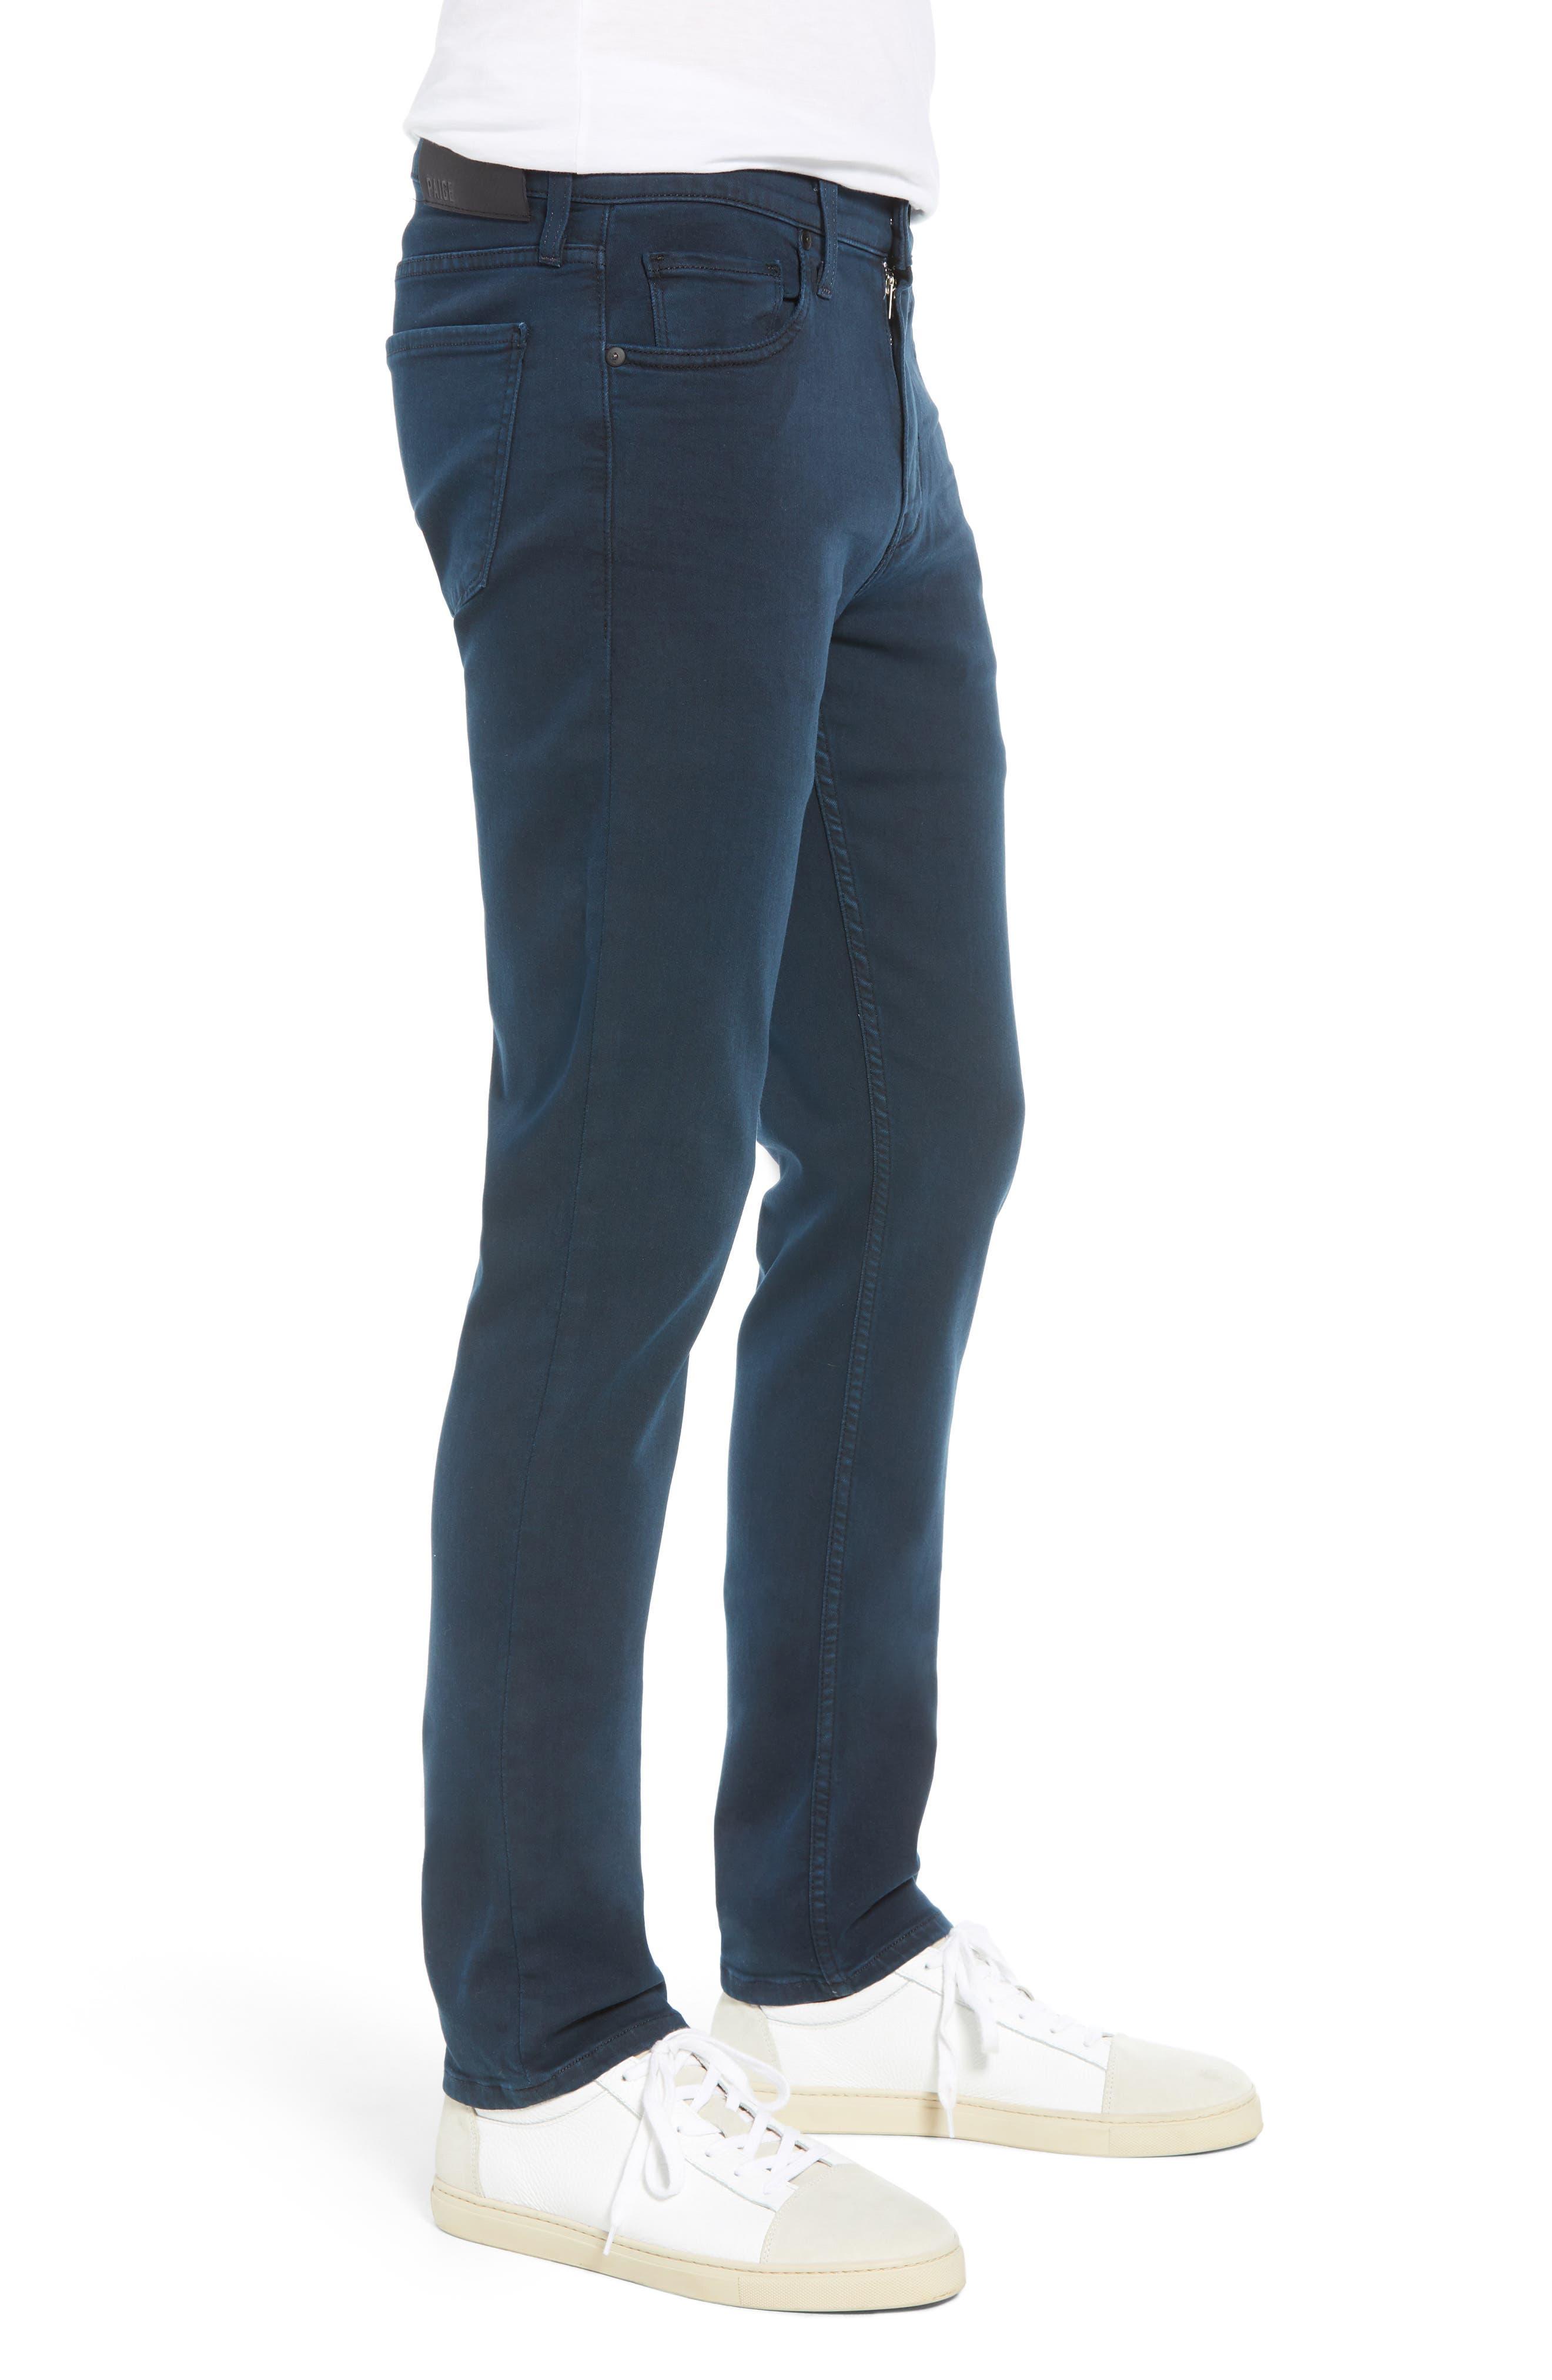 Transcend - Lennox Slim Jeans,                             Alternate thumbnail 3, color,                             401